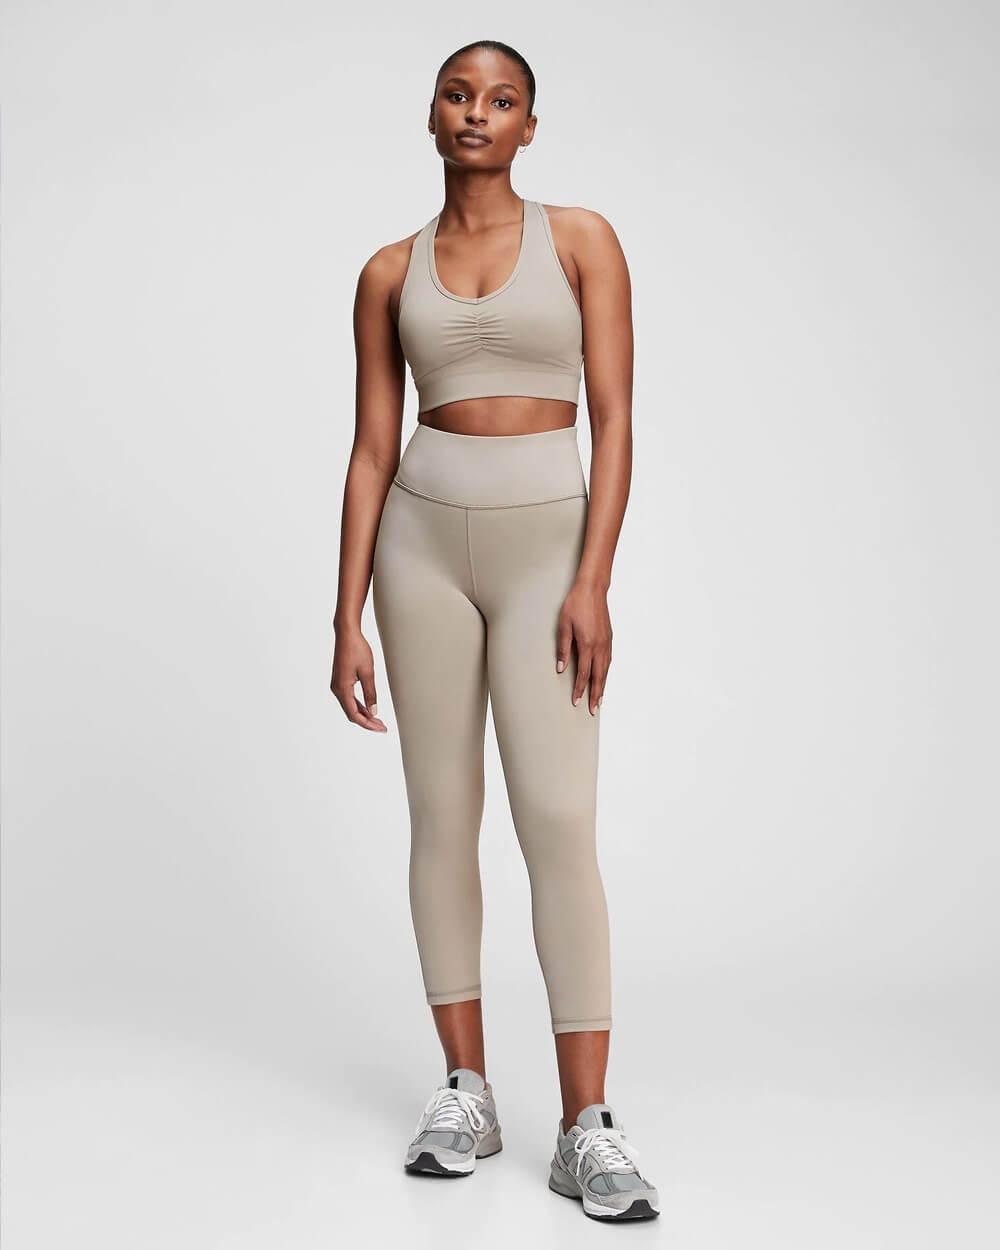 Gap cheap workout clothes